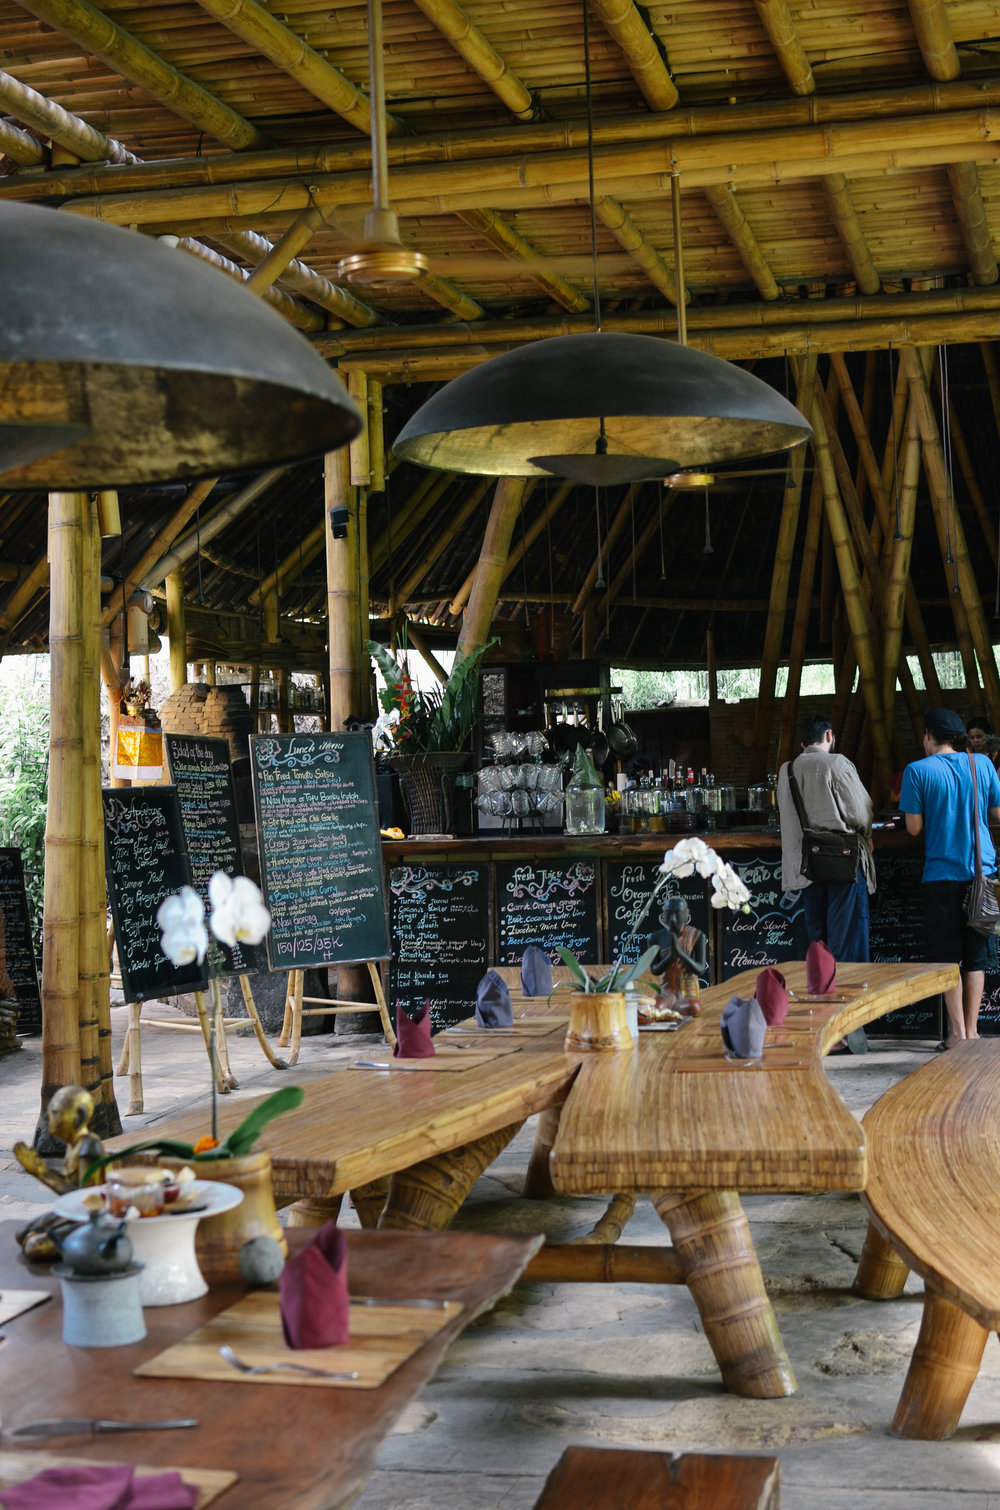 bali+mosca+bamboo+lodge+bali+ubud+lifeonpine_DSC_2789.jpg